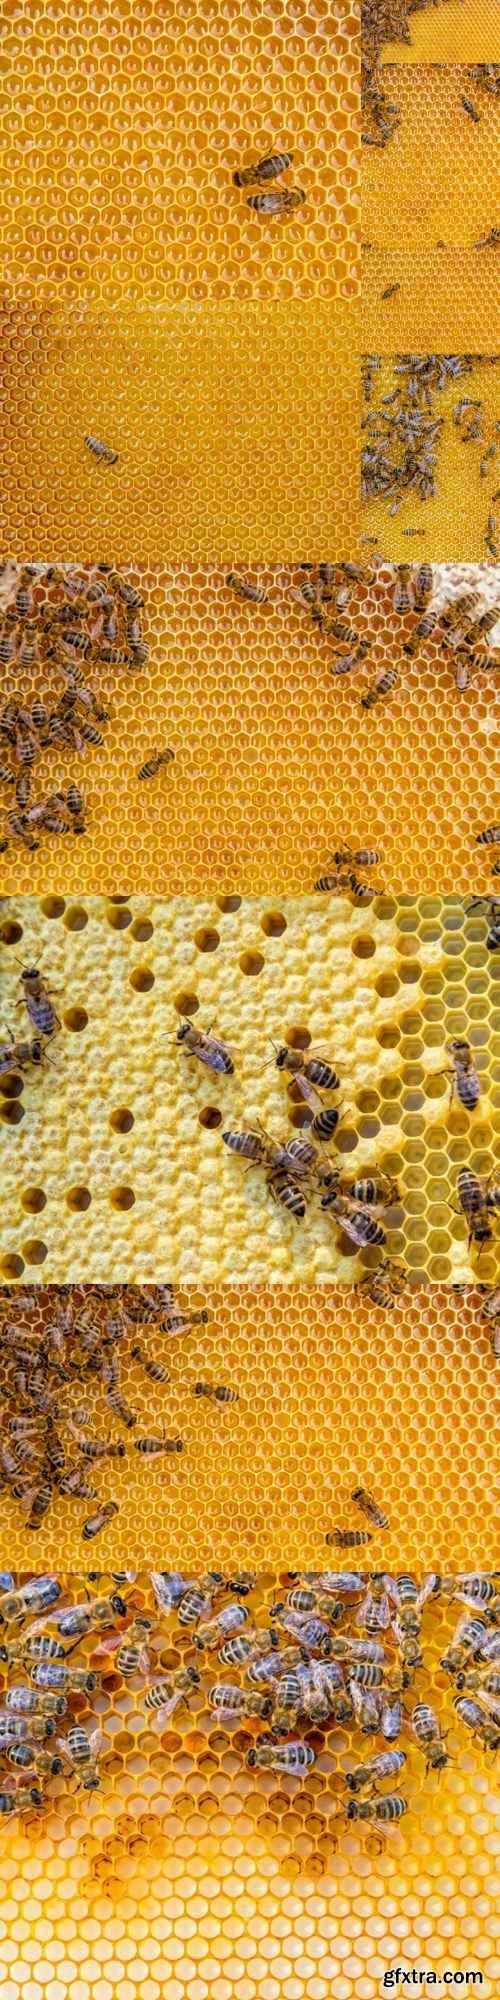 Bee honeycomb - 10 UHQ JPEG